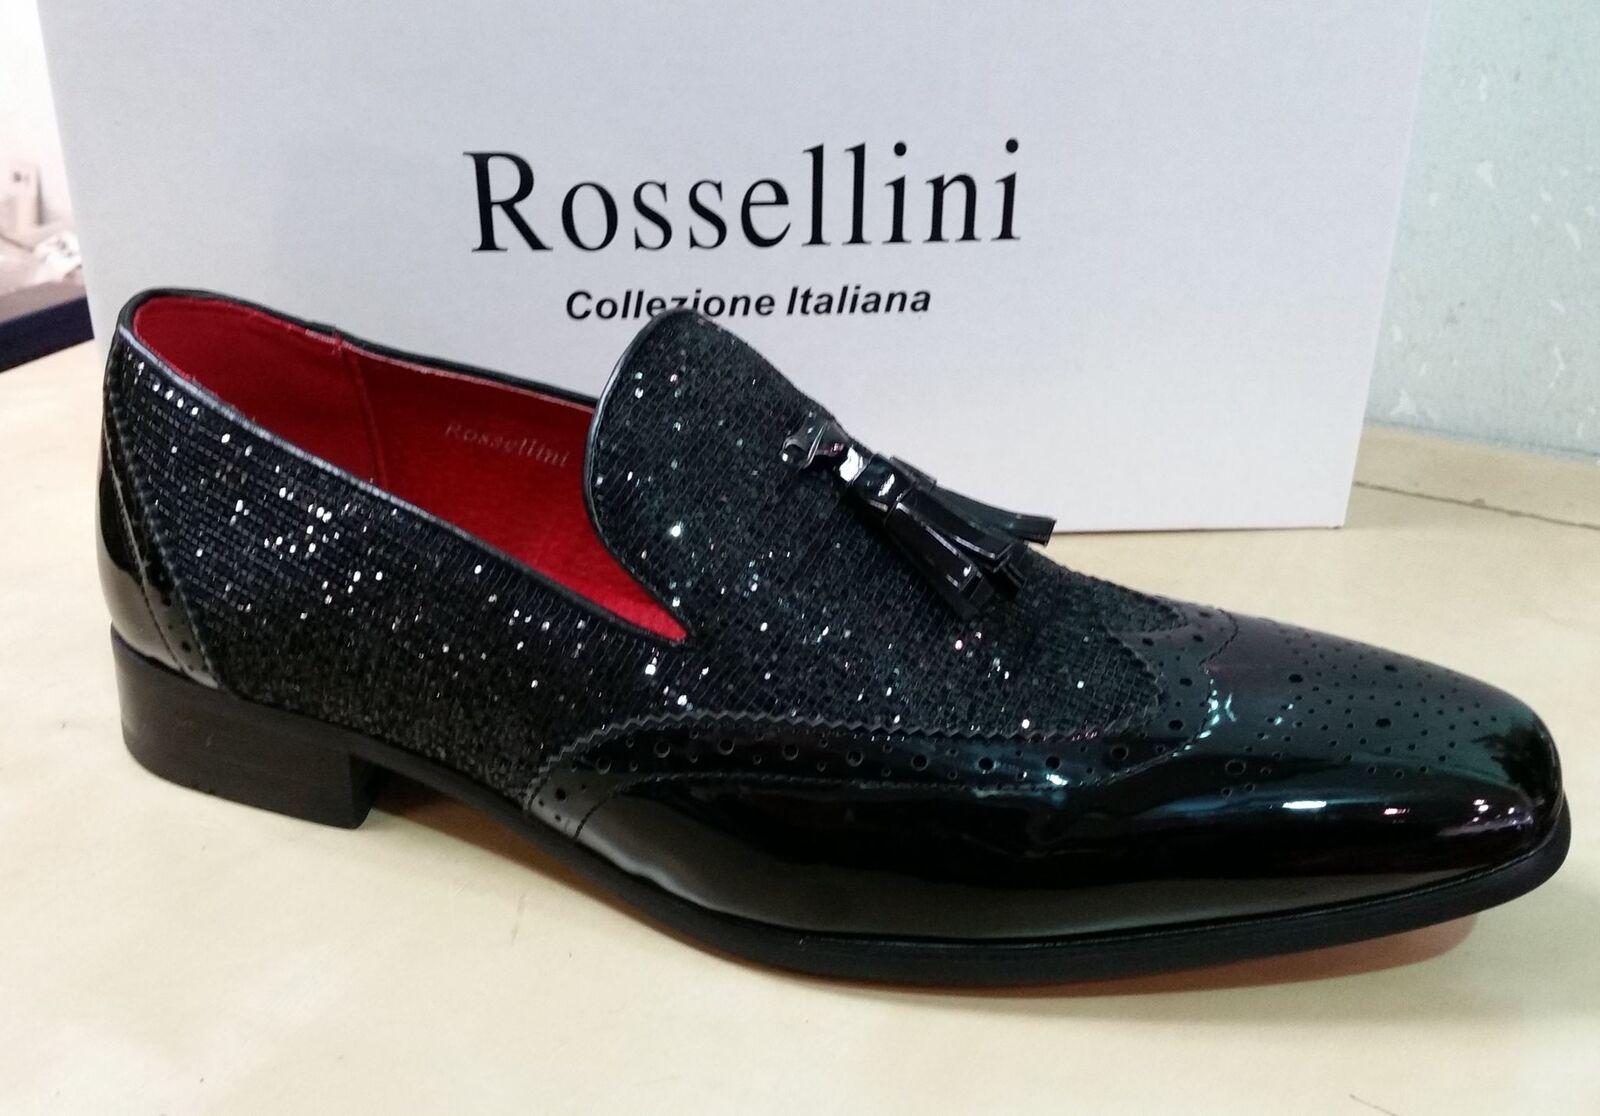 Rossellini Antonio Patent Mens Leather Lined Brogues Patent Antonio Tassle Loafer Shoes 67f43e